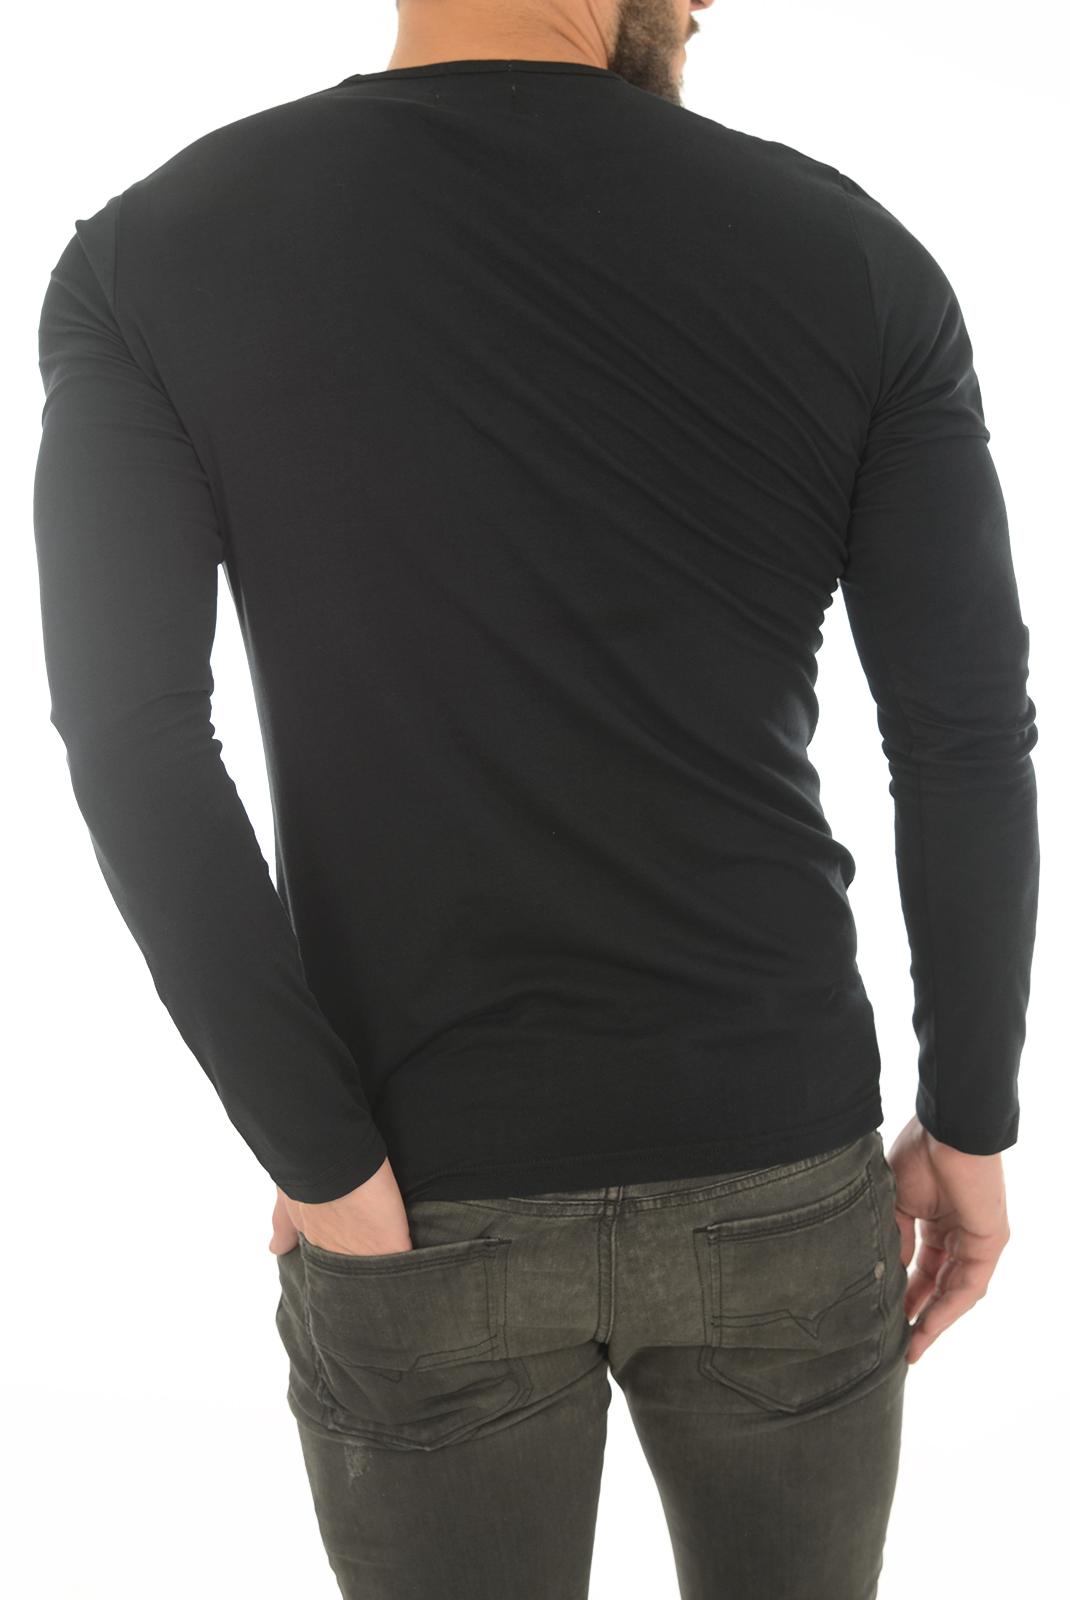 Tee-shirts  Pepe jeans PM503803 ORIGINAL BASIC L/S 999 BLACK